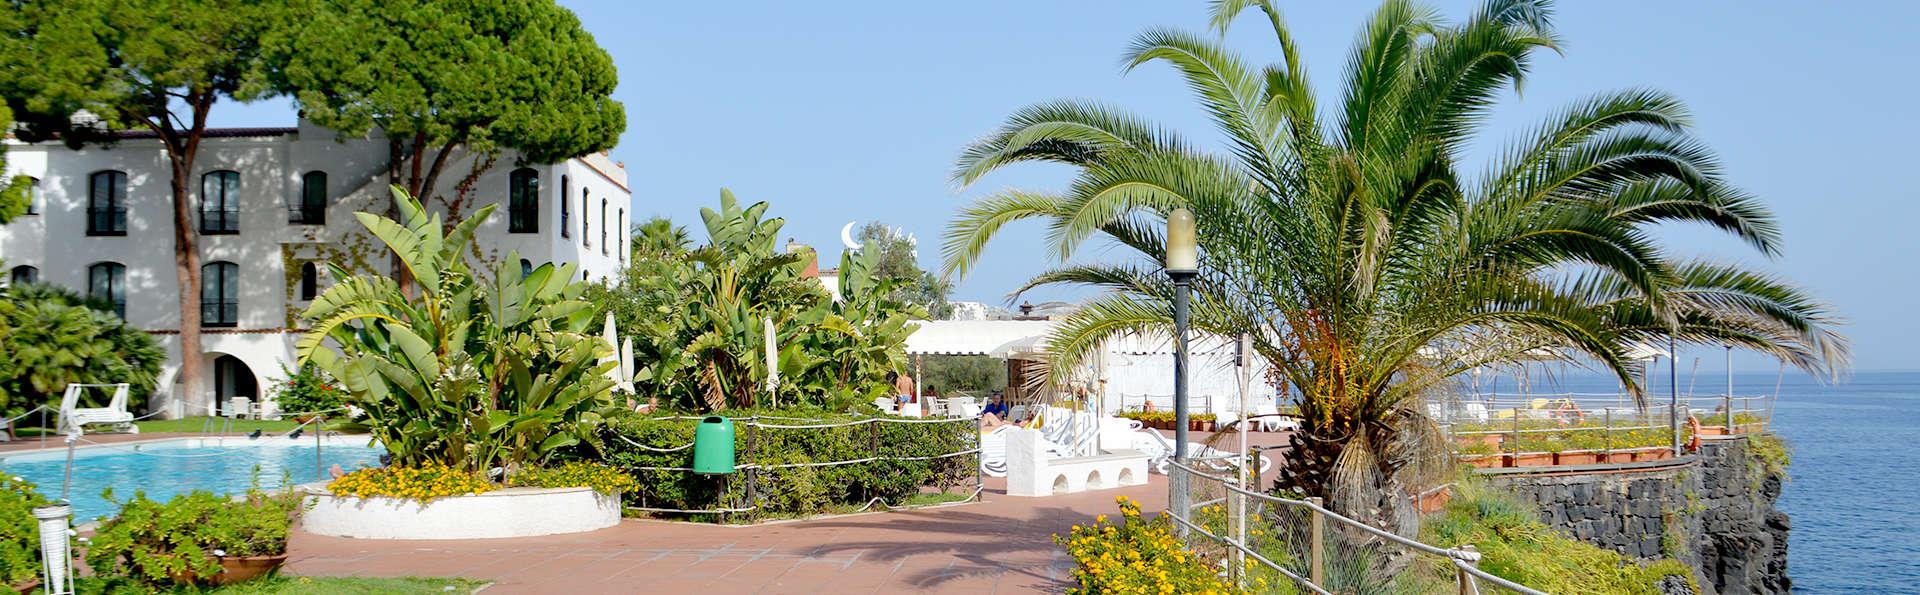 Grand Hotel Baia Verde - Edit_Terrace2.jpg